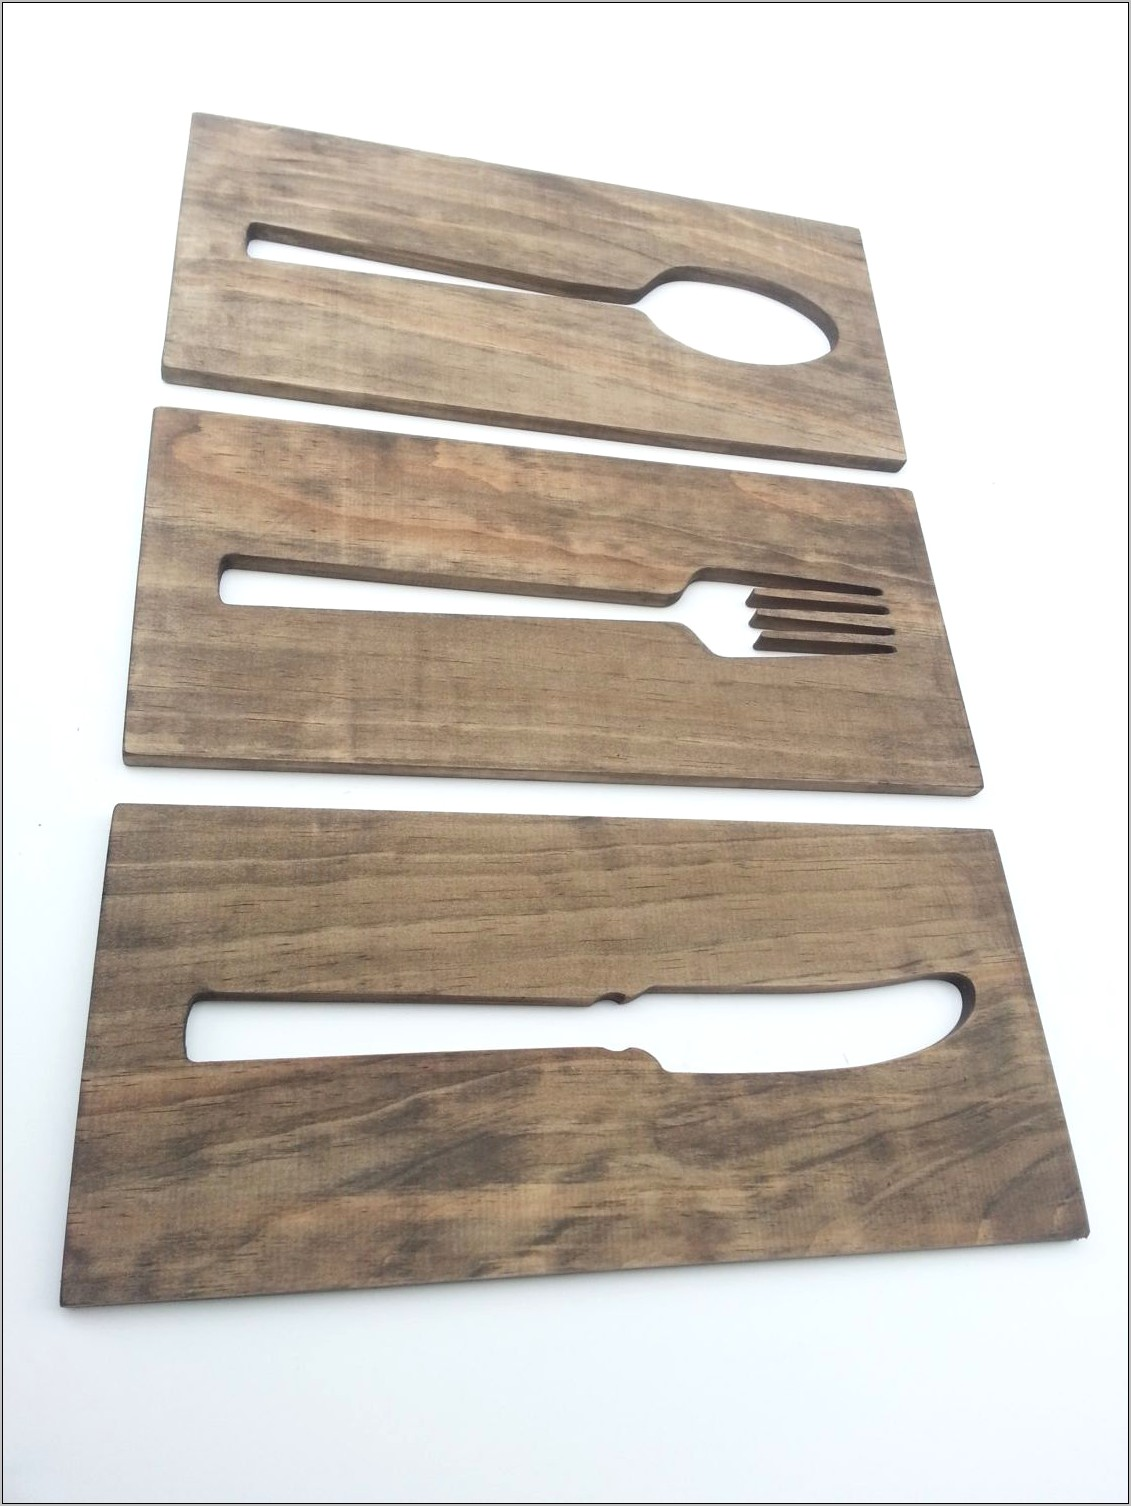 Spoon Knife Fork Kitchen Decor